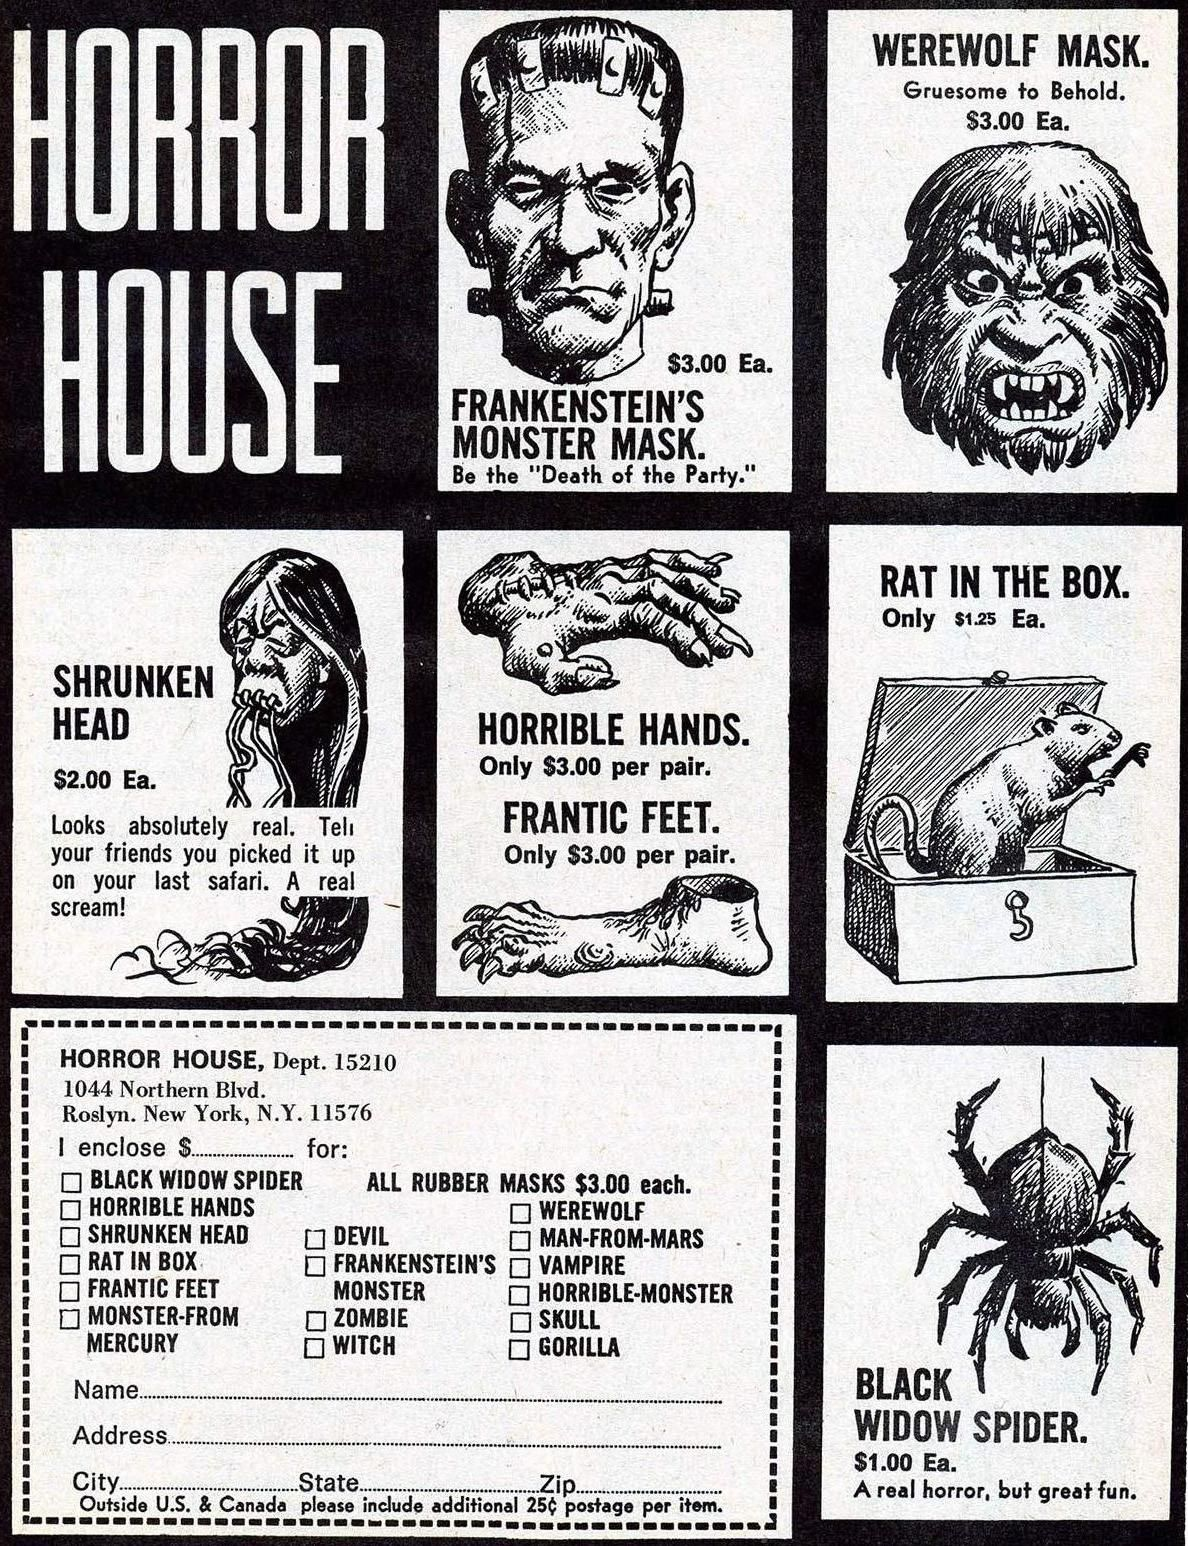 1960s Horror House ad.